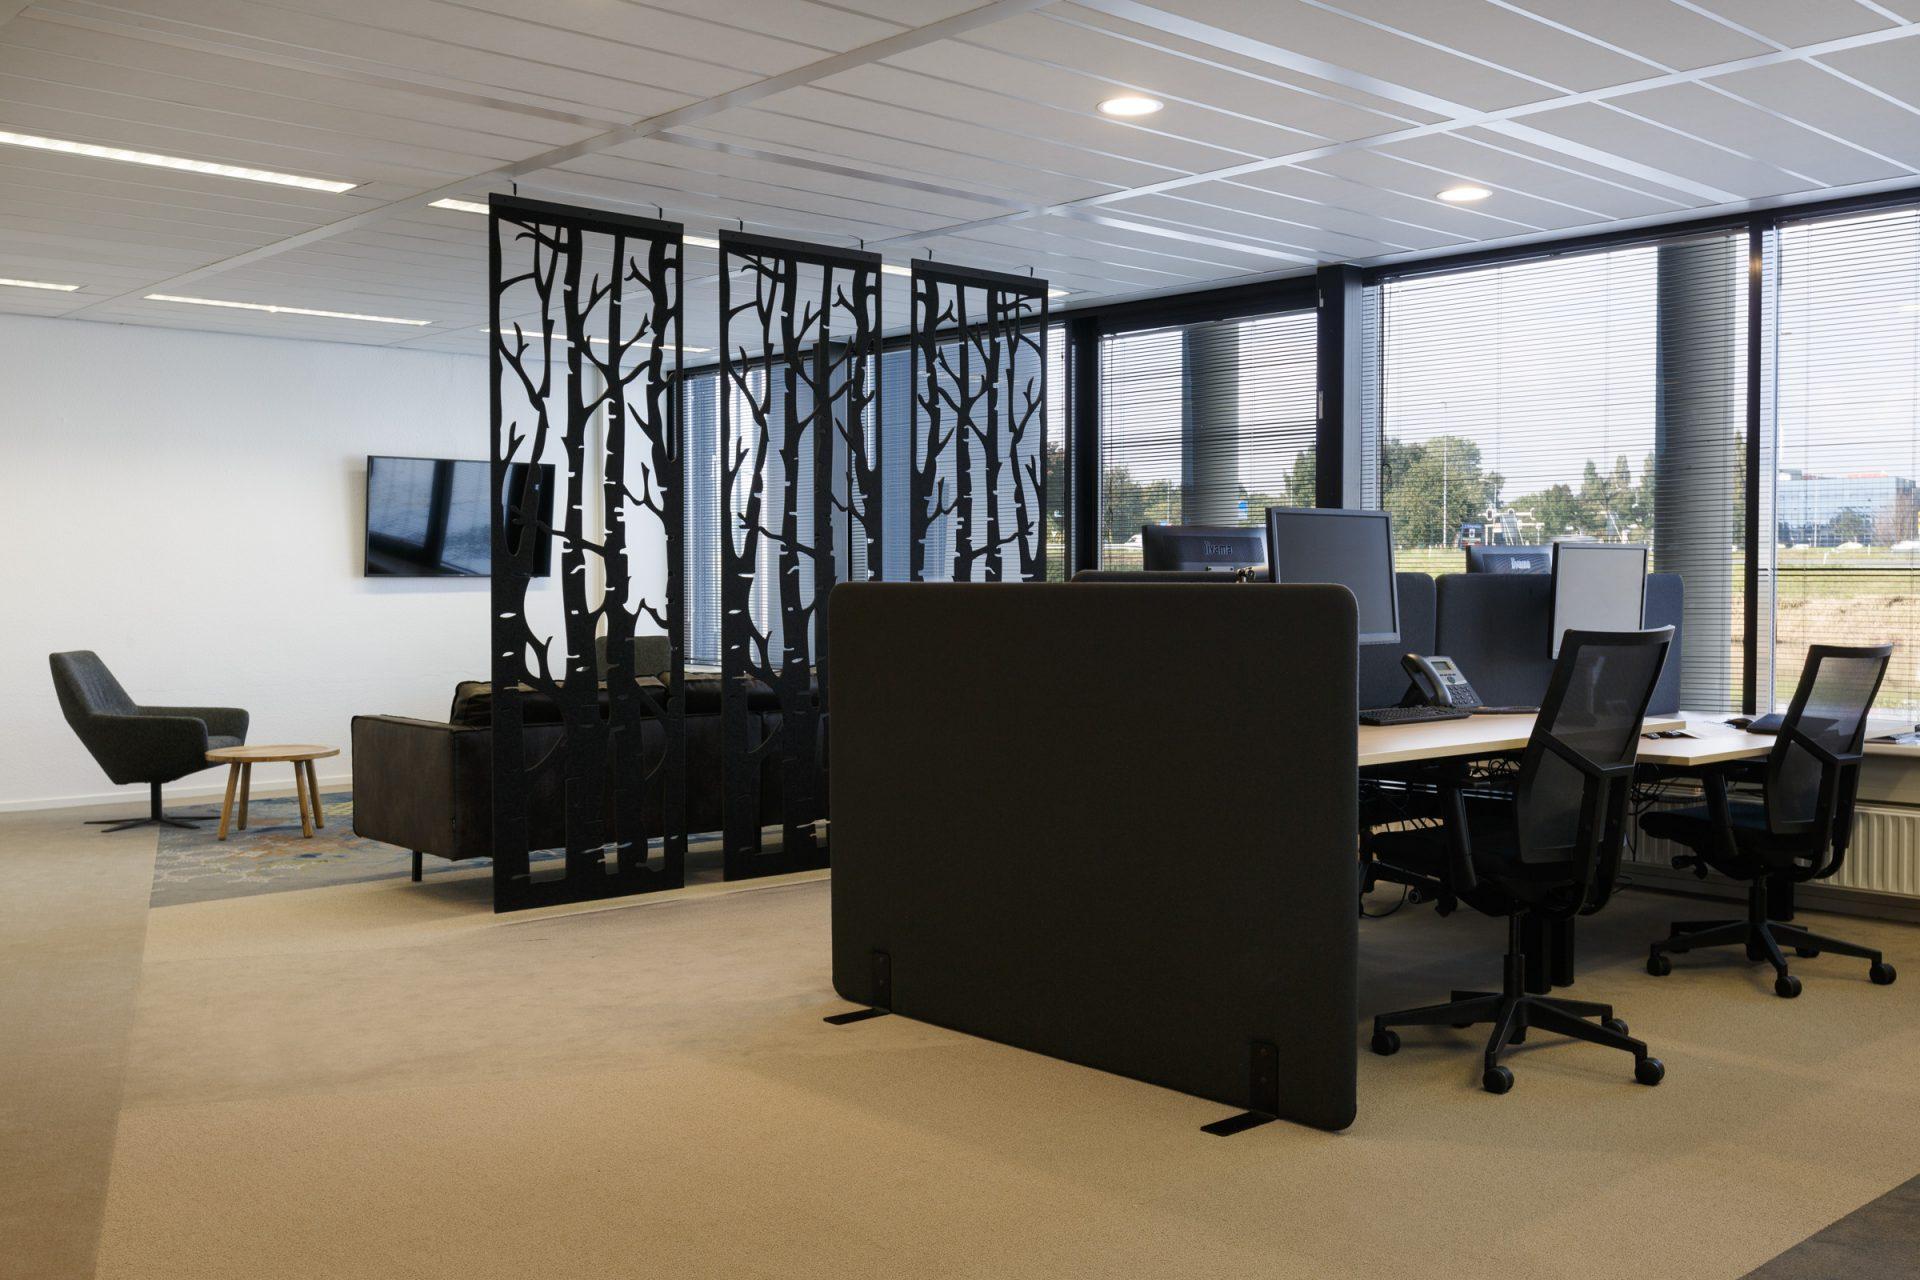 RubiX s-Hertogenbosch - Topperprojecten 12